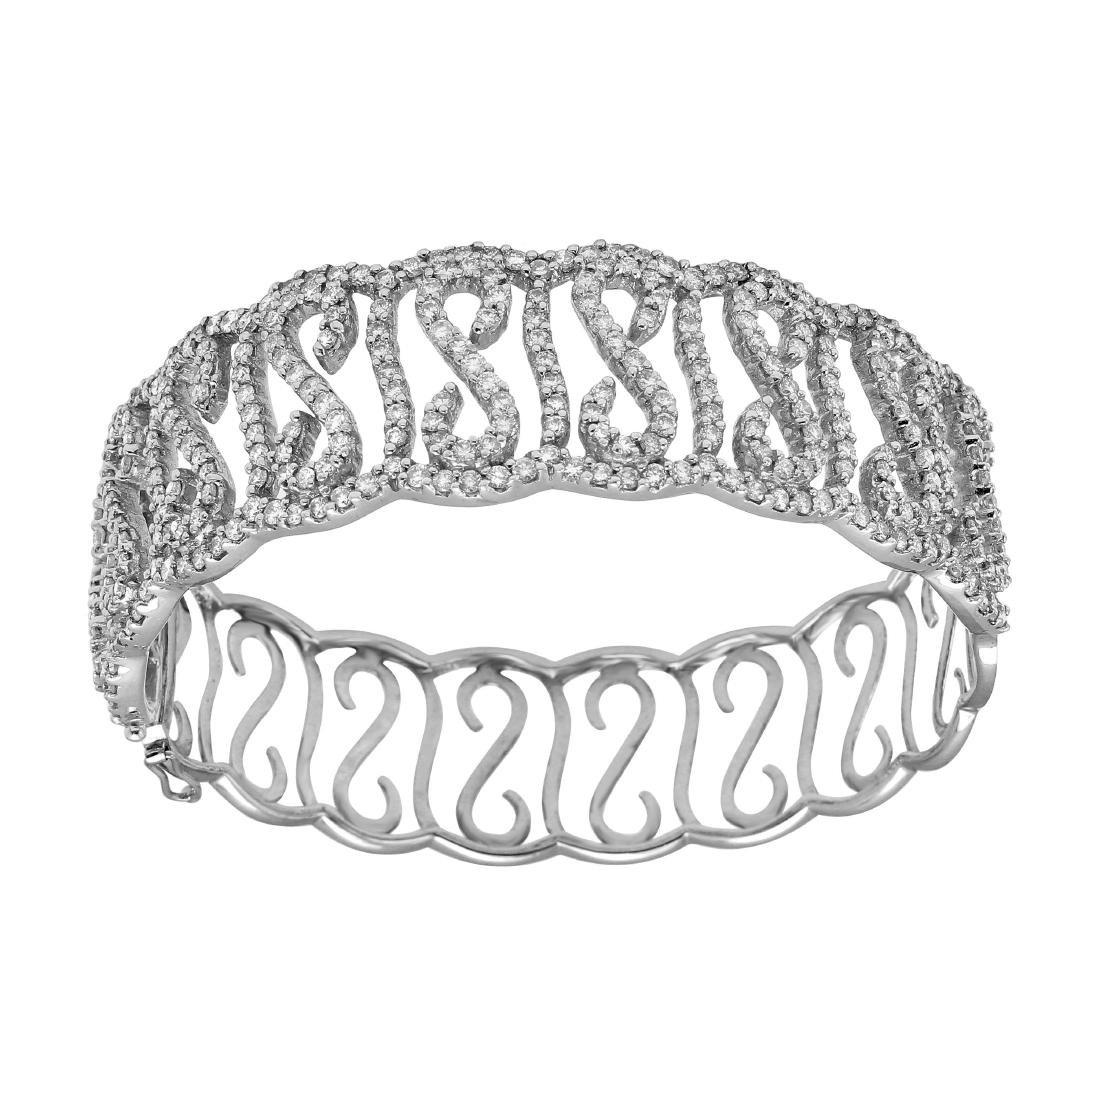 18KT White Gold Diamond Bangle Bracelet - 2